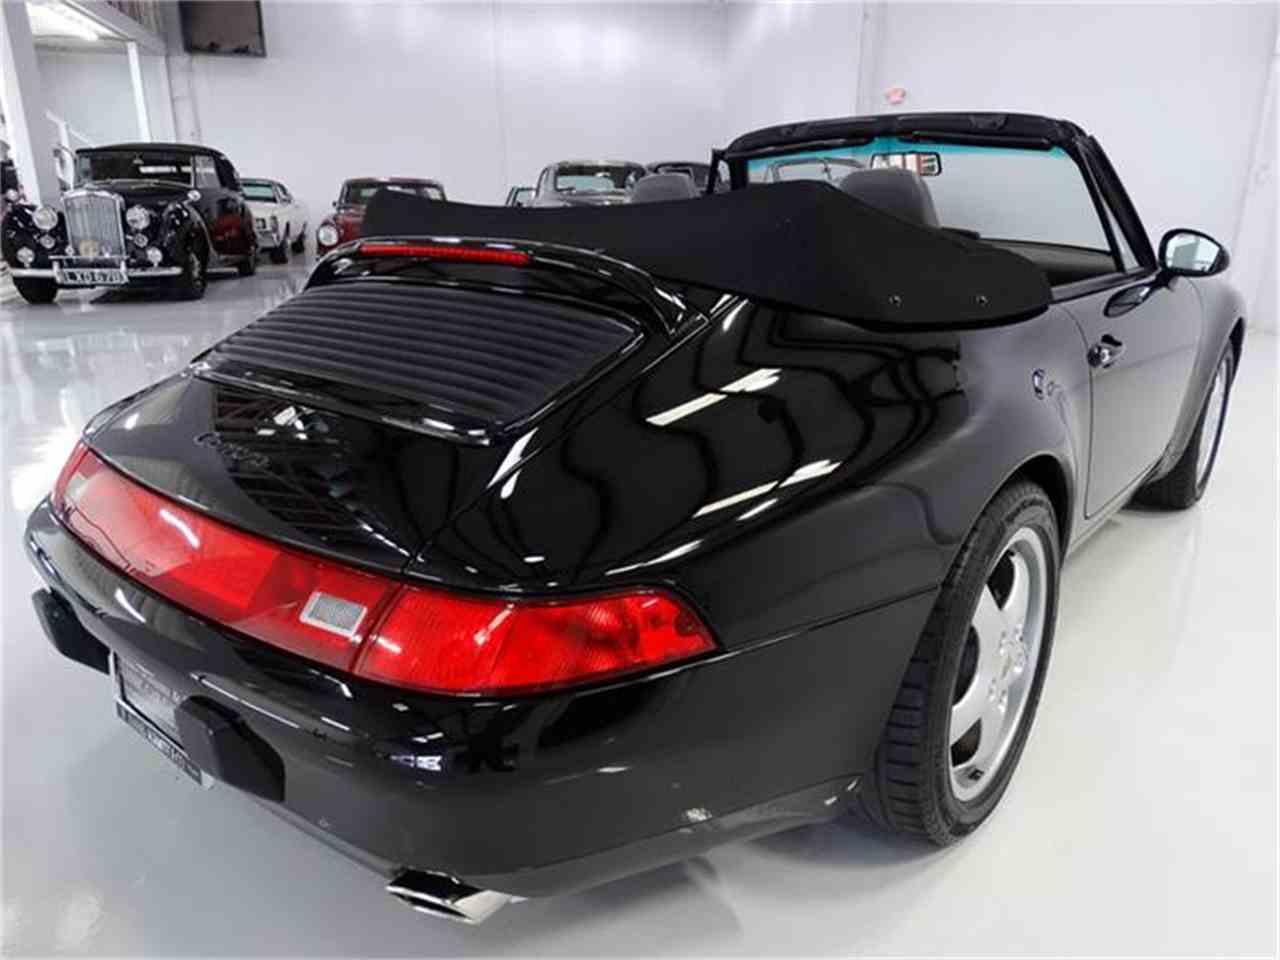 1998 porsche 911 carrera for sale cc. Black Bedroom Furniture Sets. Home Design Ideas